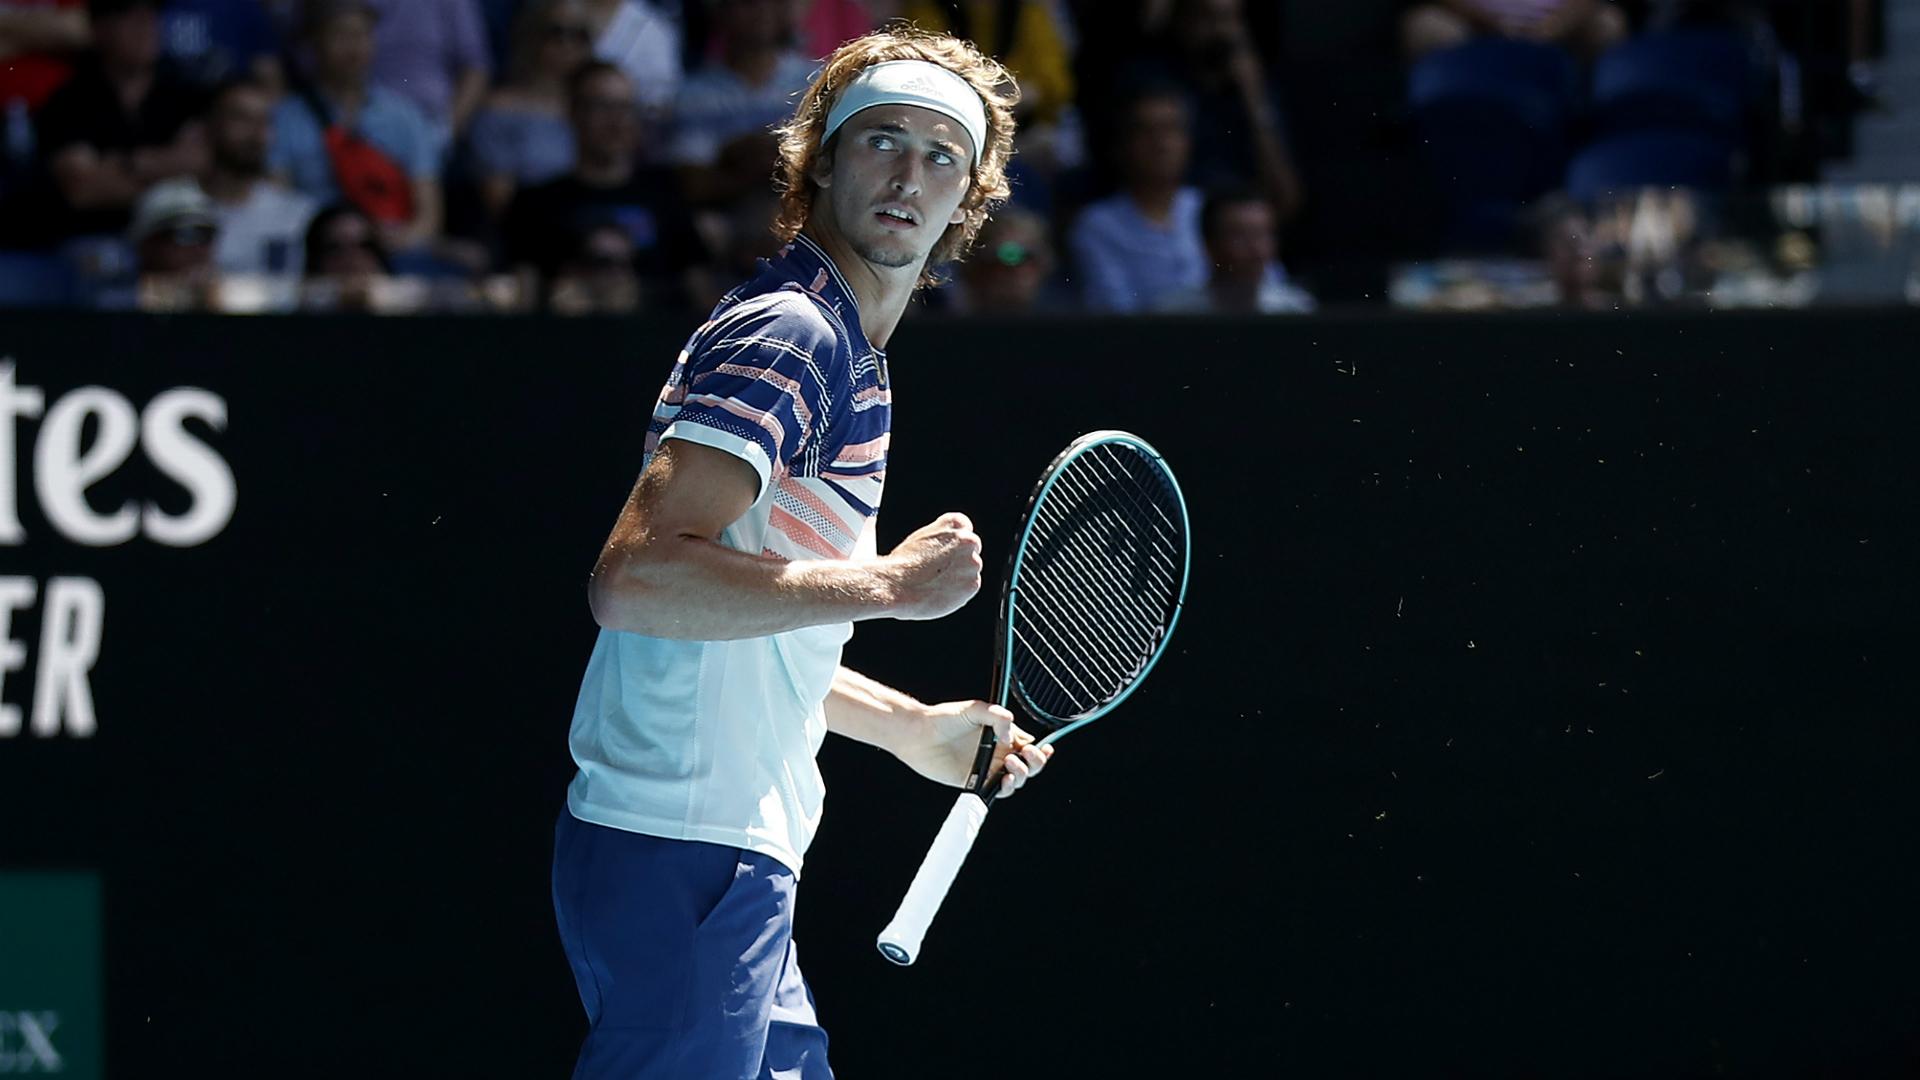 Australian Open 2020: Semi-final bound Zverev breaks new ground to stun Wawrinka